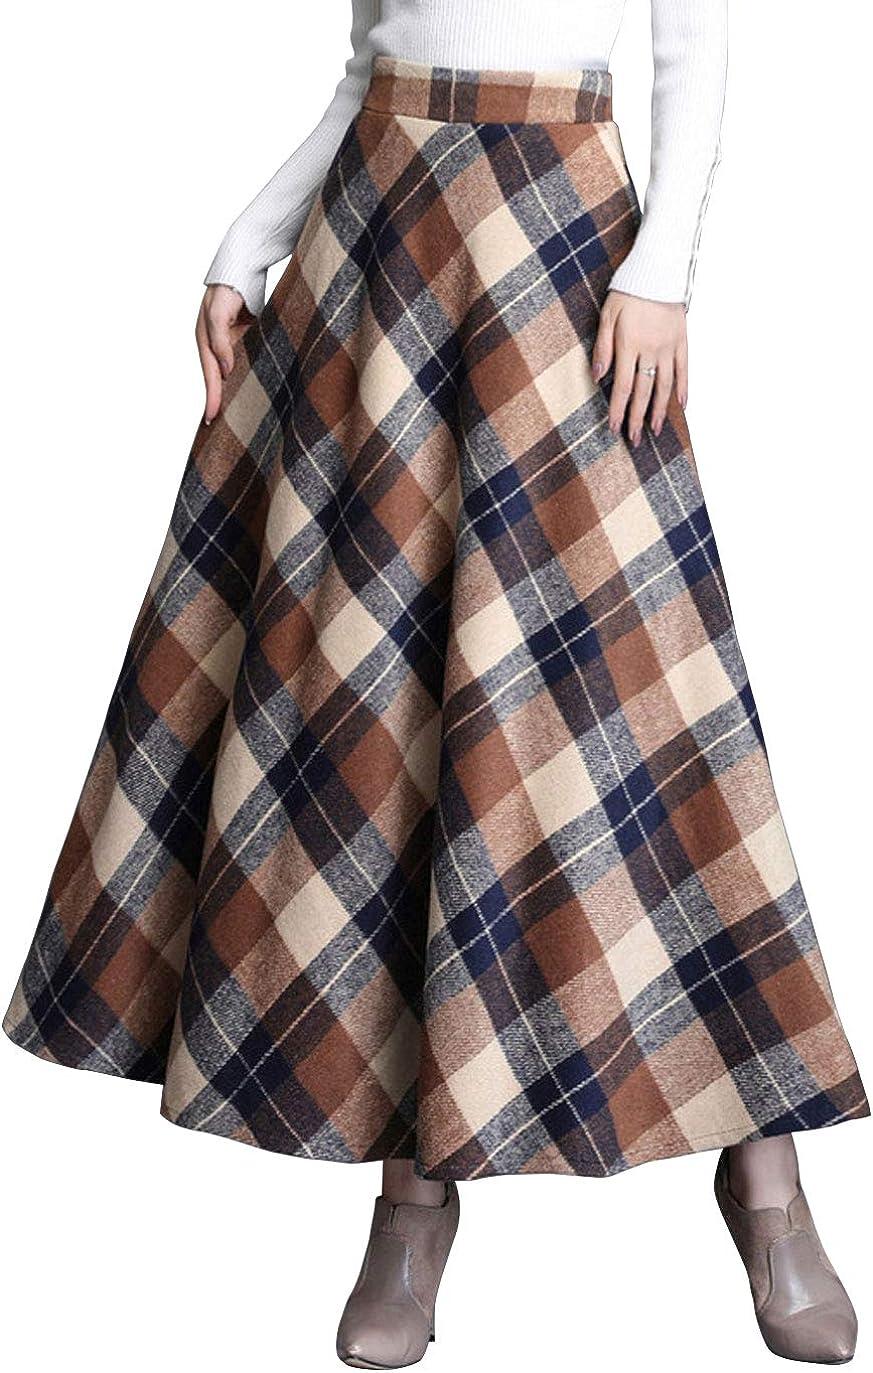 ebossy Women's Vintage High Waist Wool Blend Plaid A-Line Long Maxi Skirt with Pocket